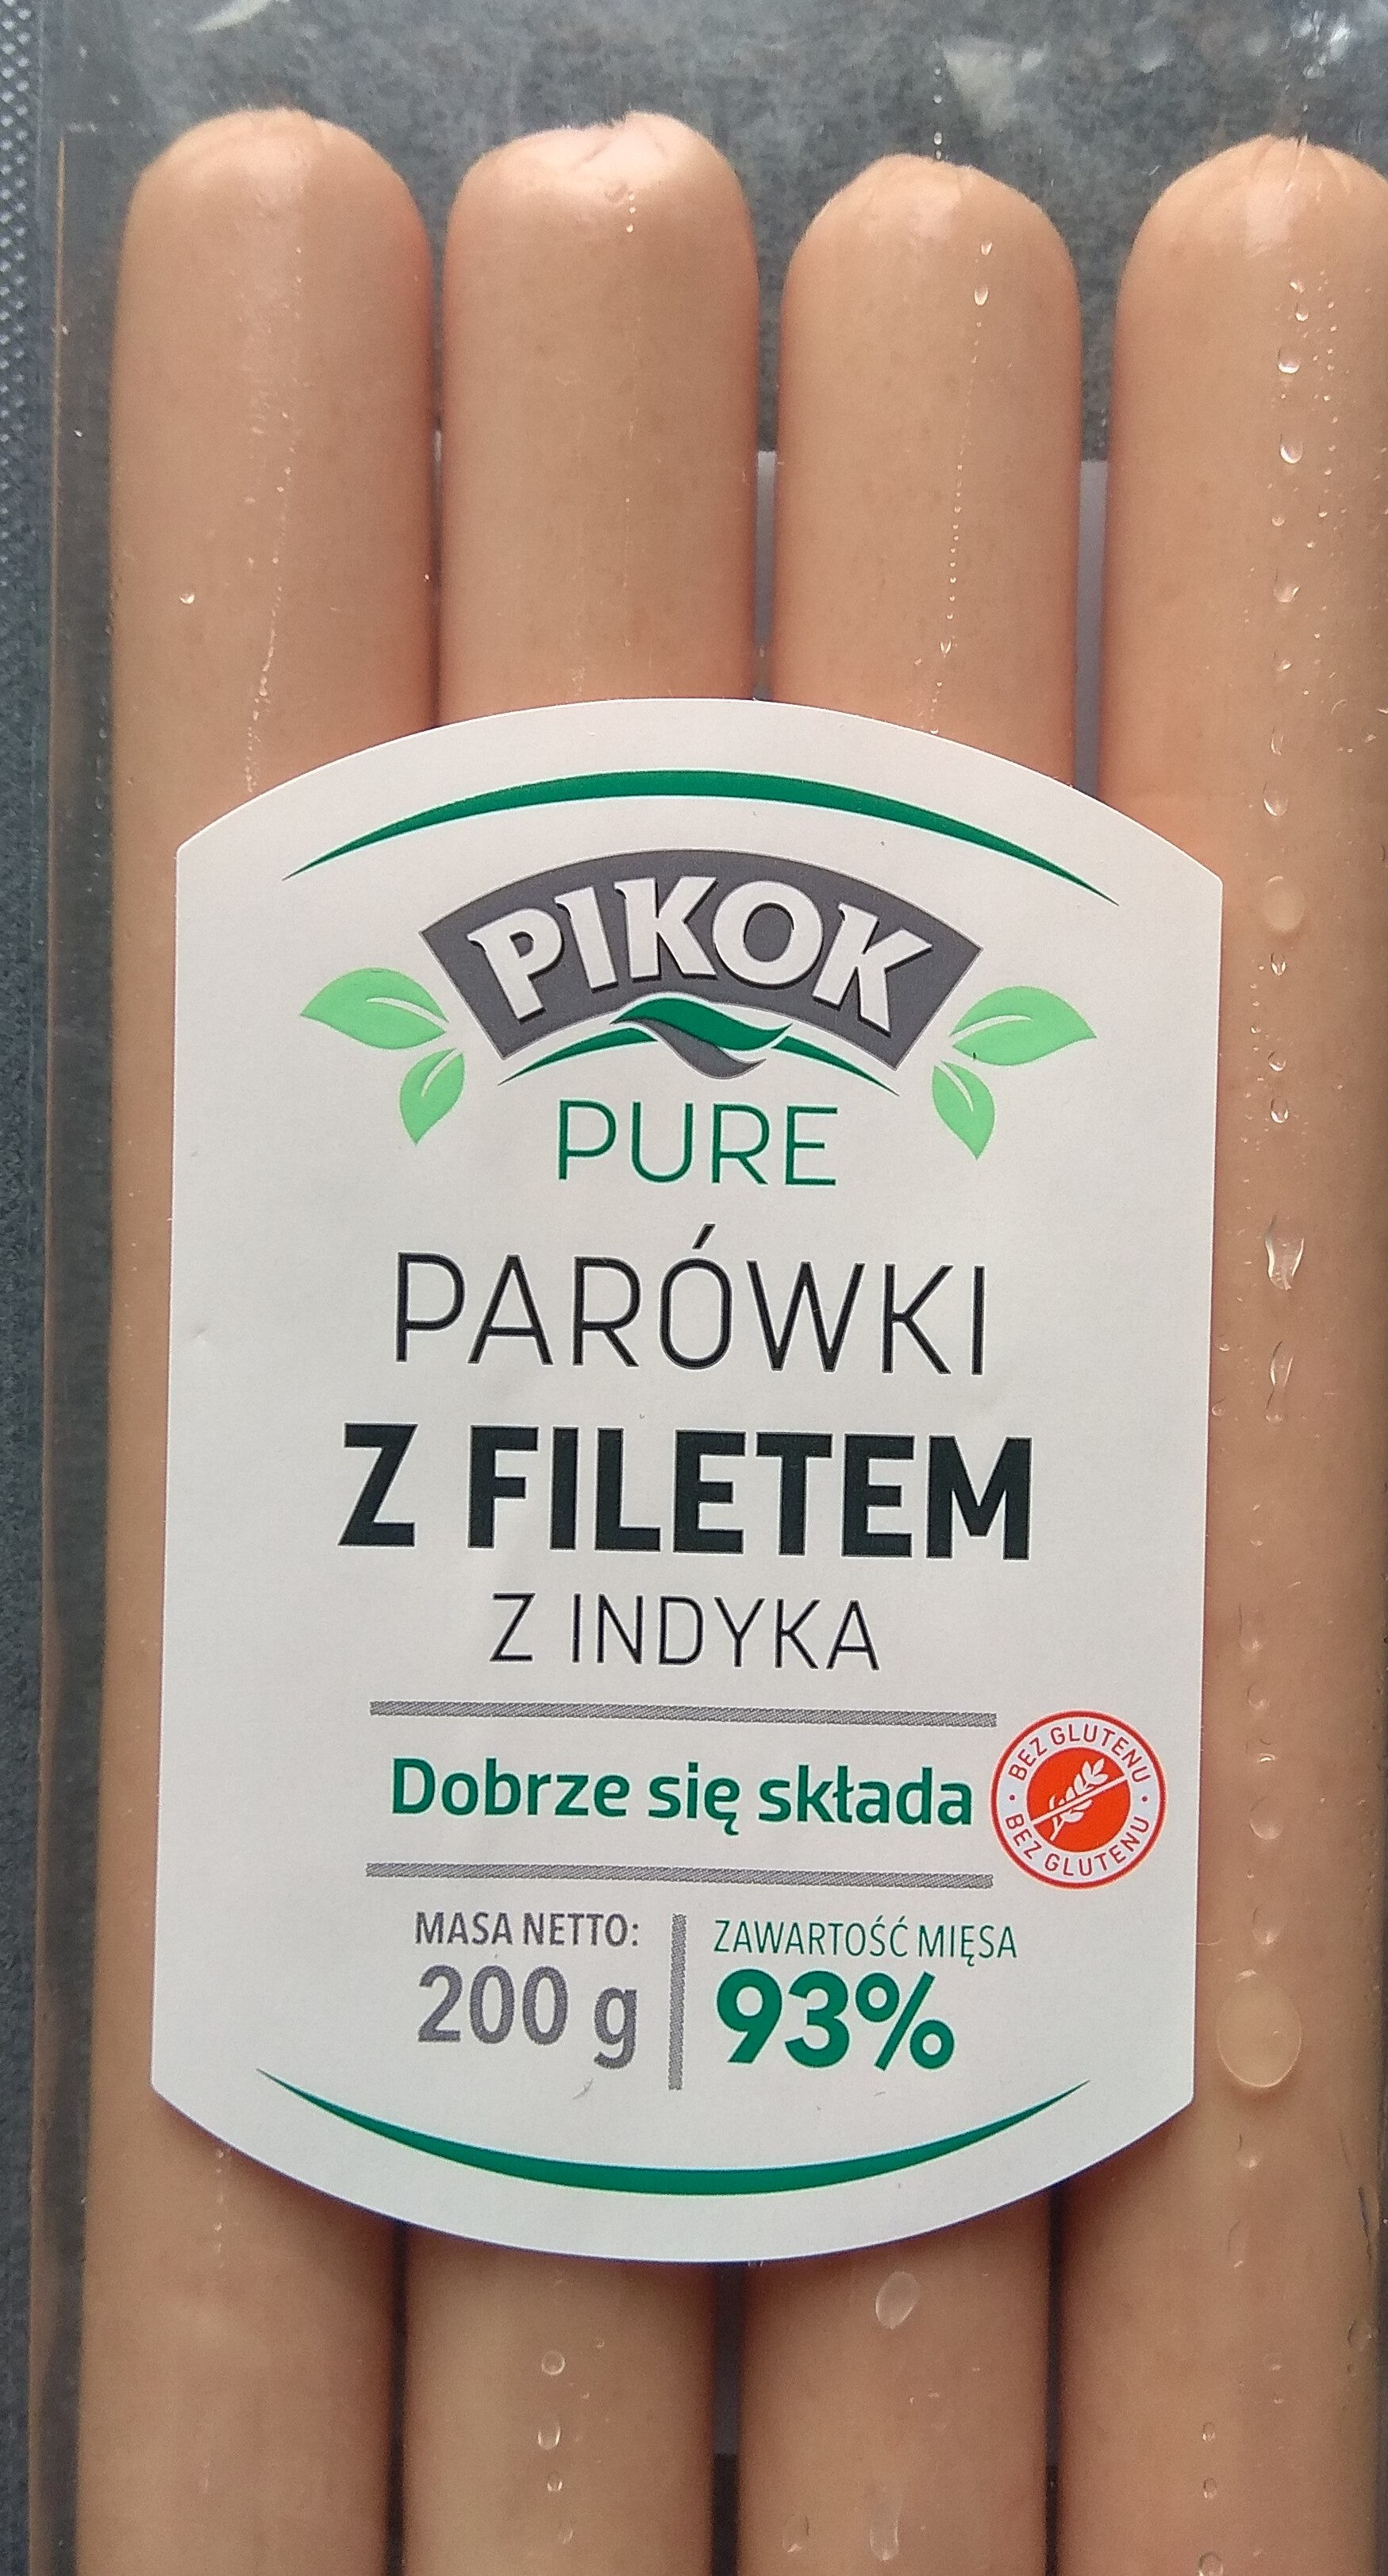 Parówki z filetem z indyka - Produkt - pl